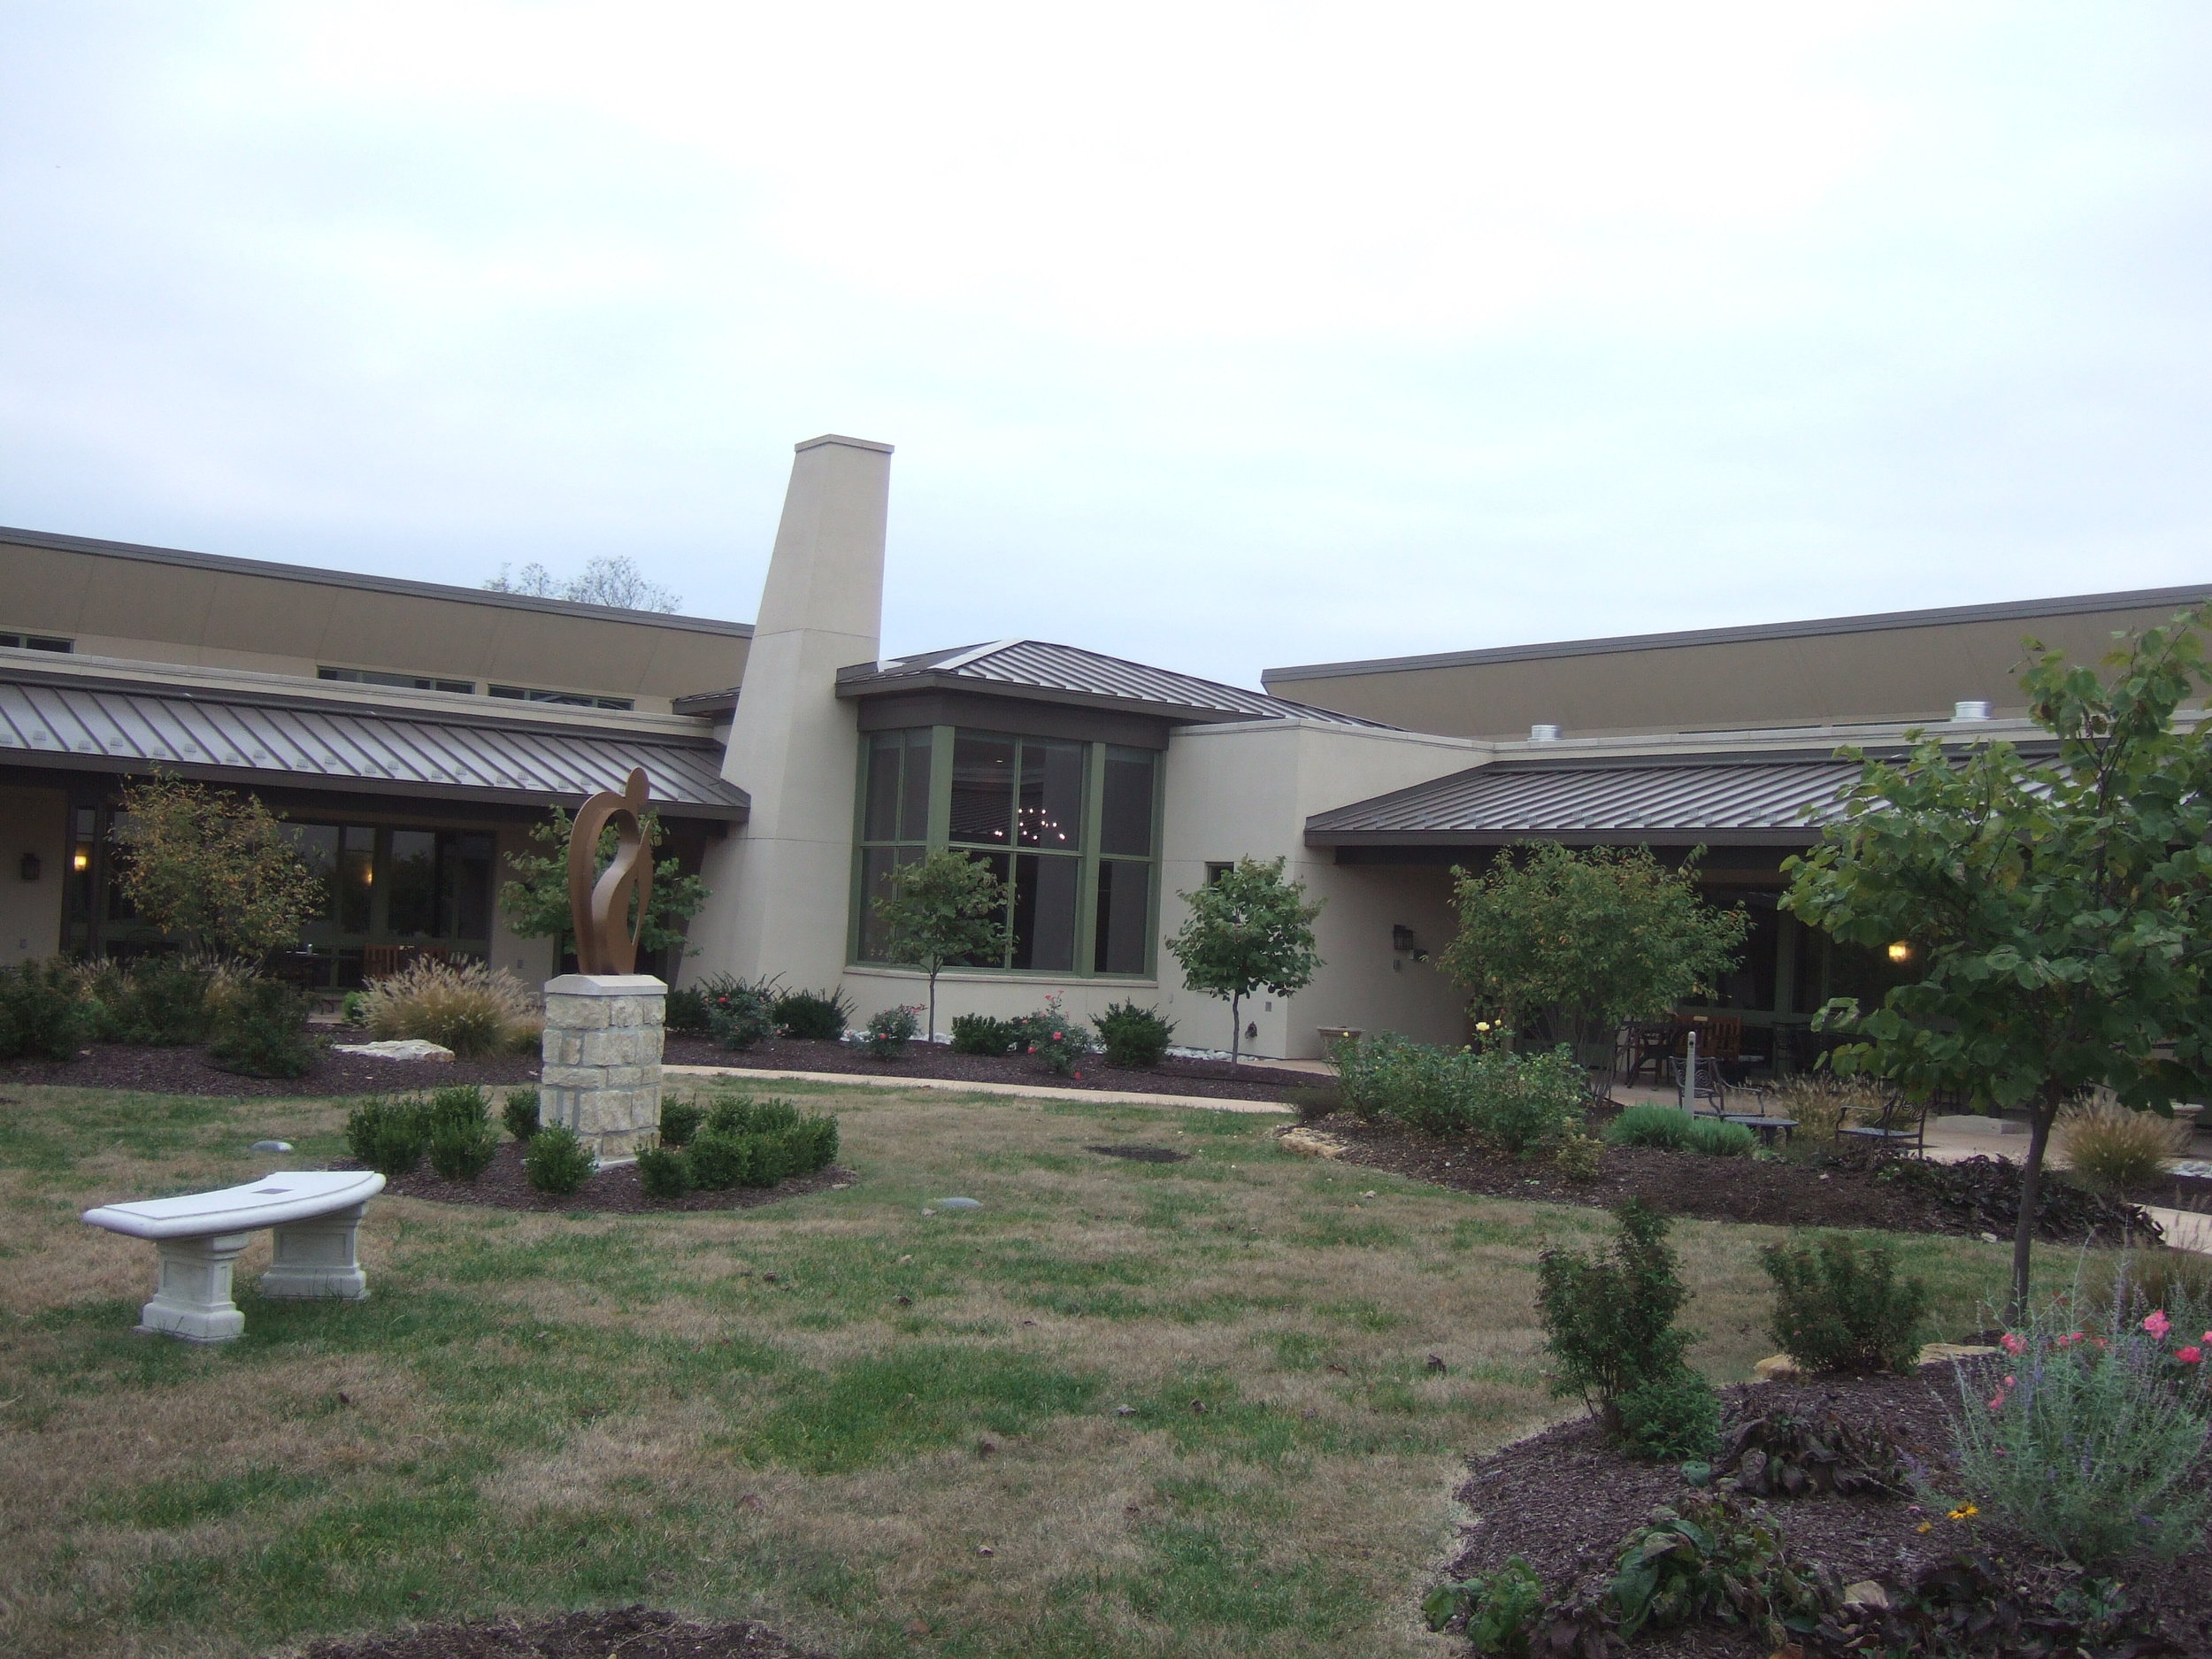 Condo_Hospice House.JPG